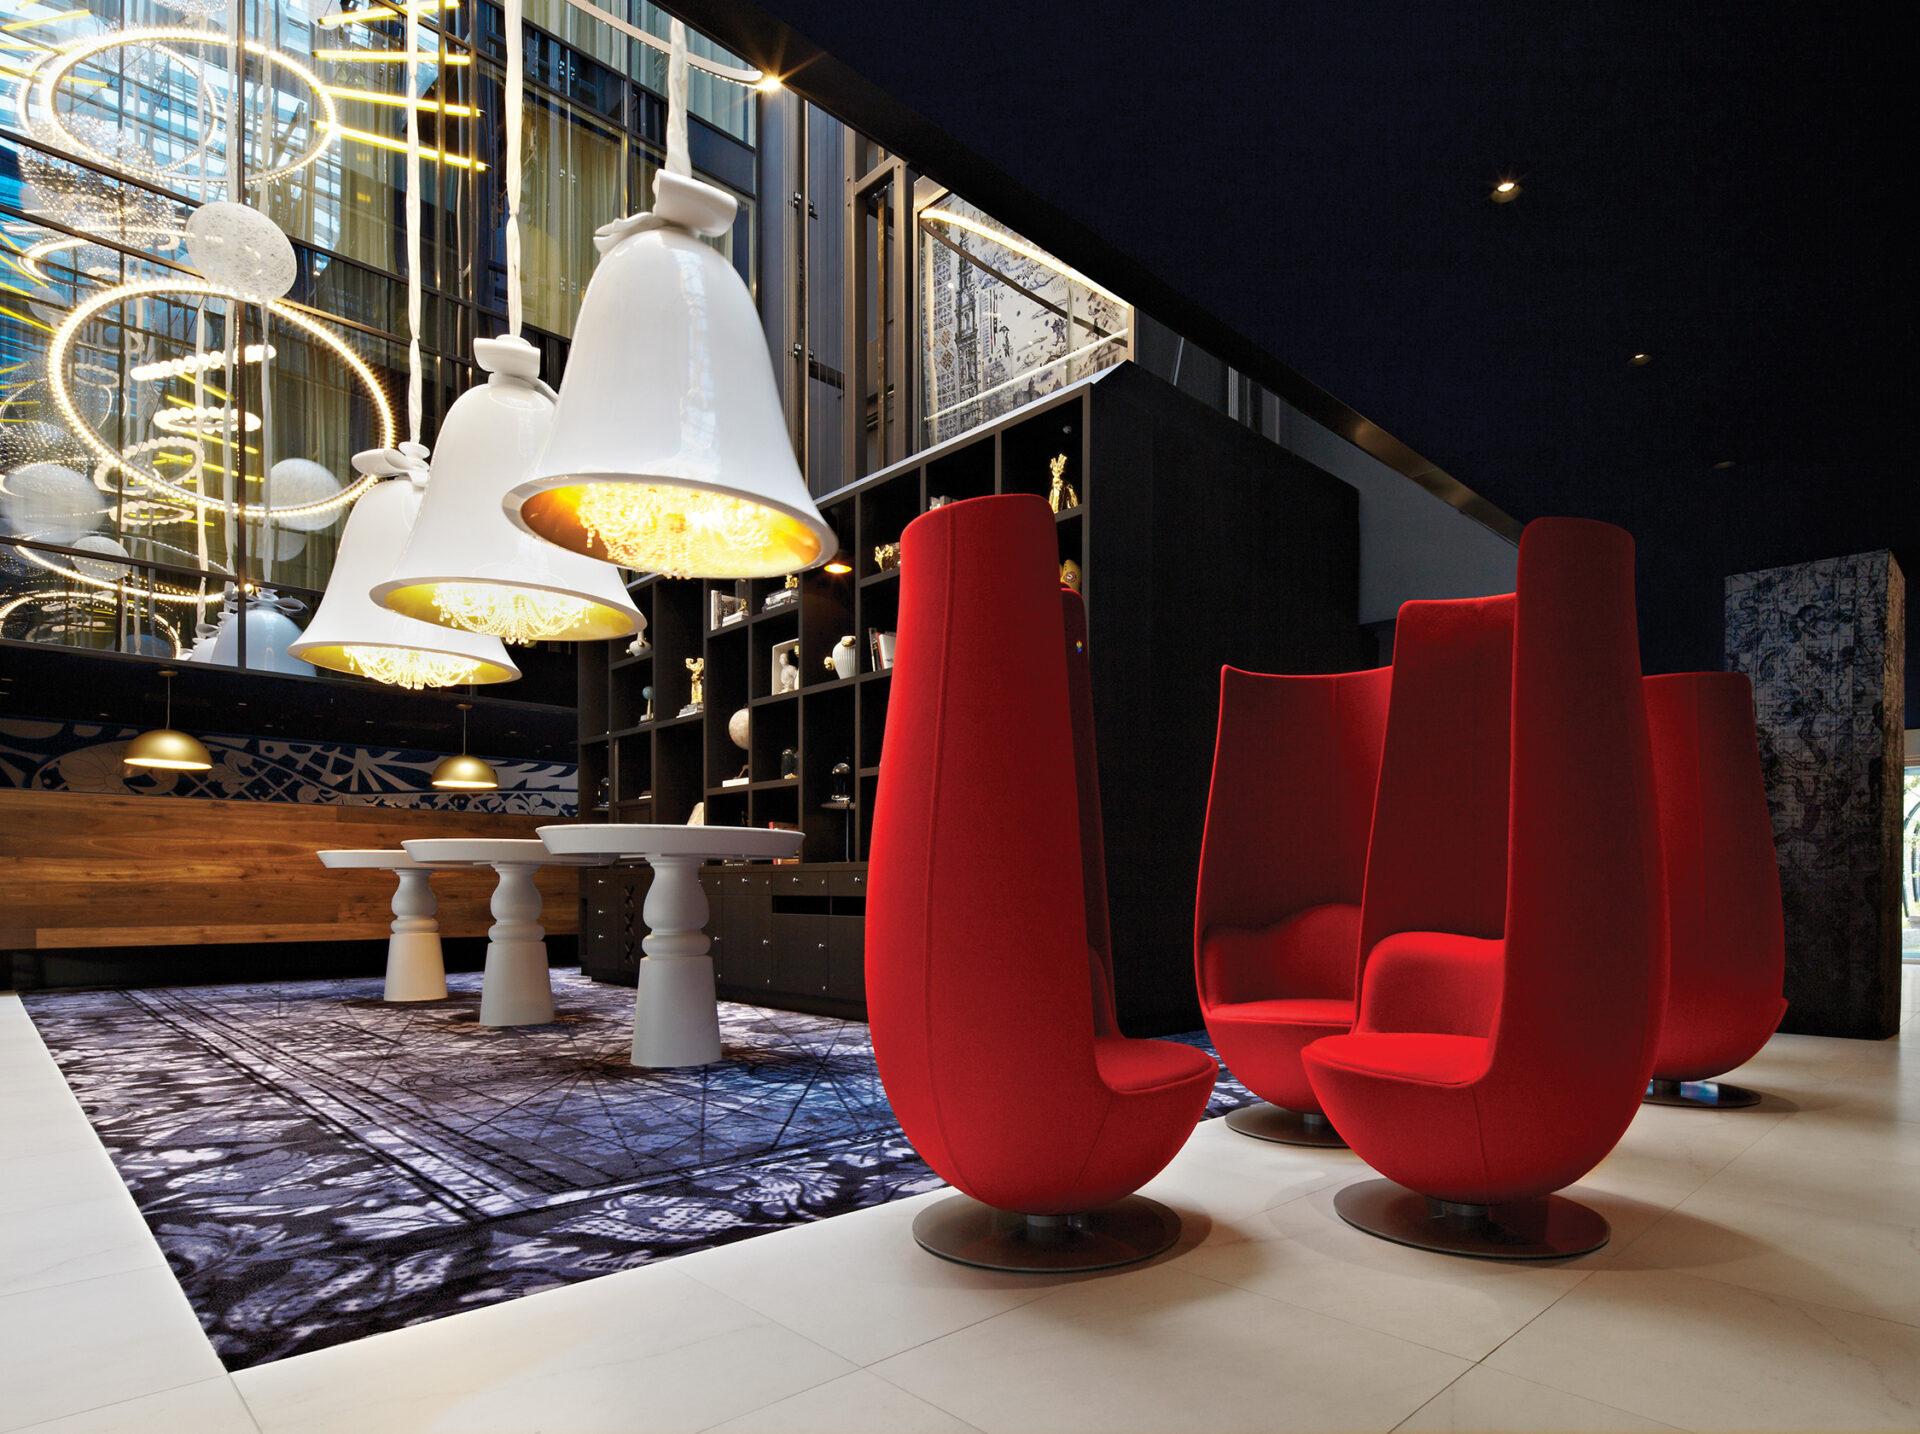 Marcel-Wanders-tulip-chairs-Andaz-Amsterdam-hotel-lobby-Venice-Nila-Do-Simon